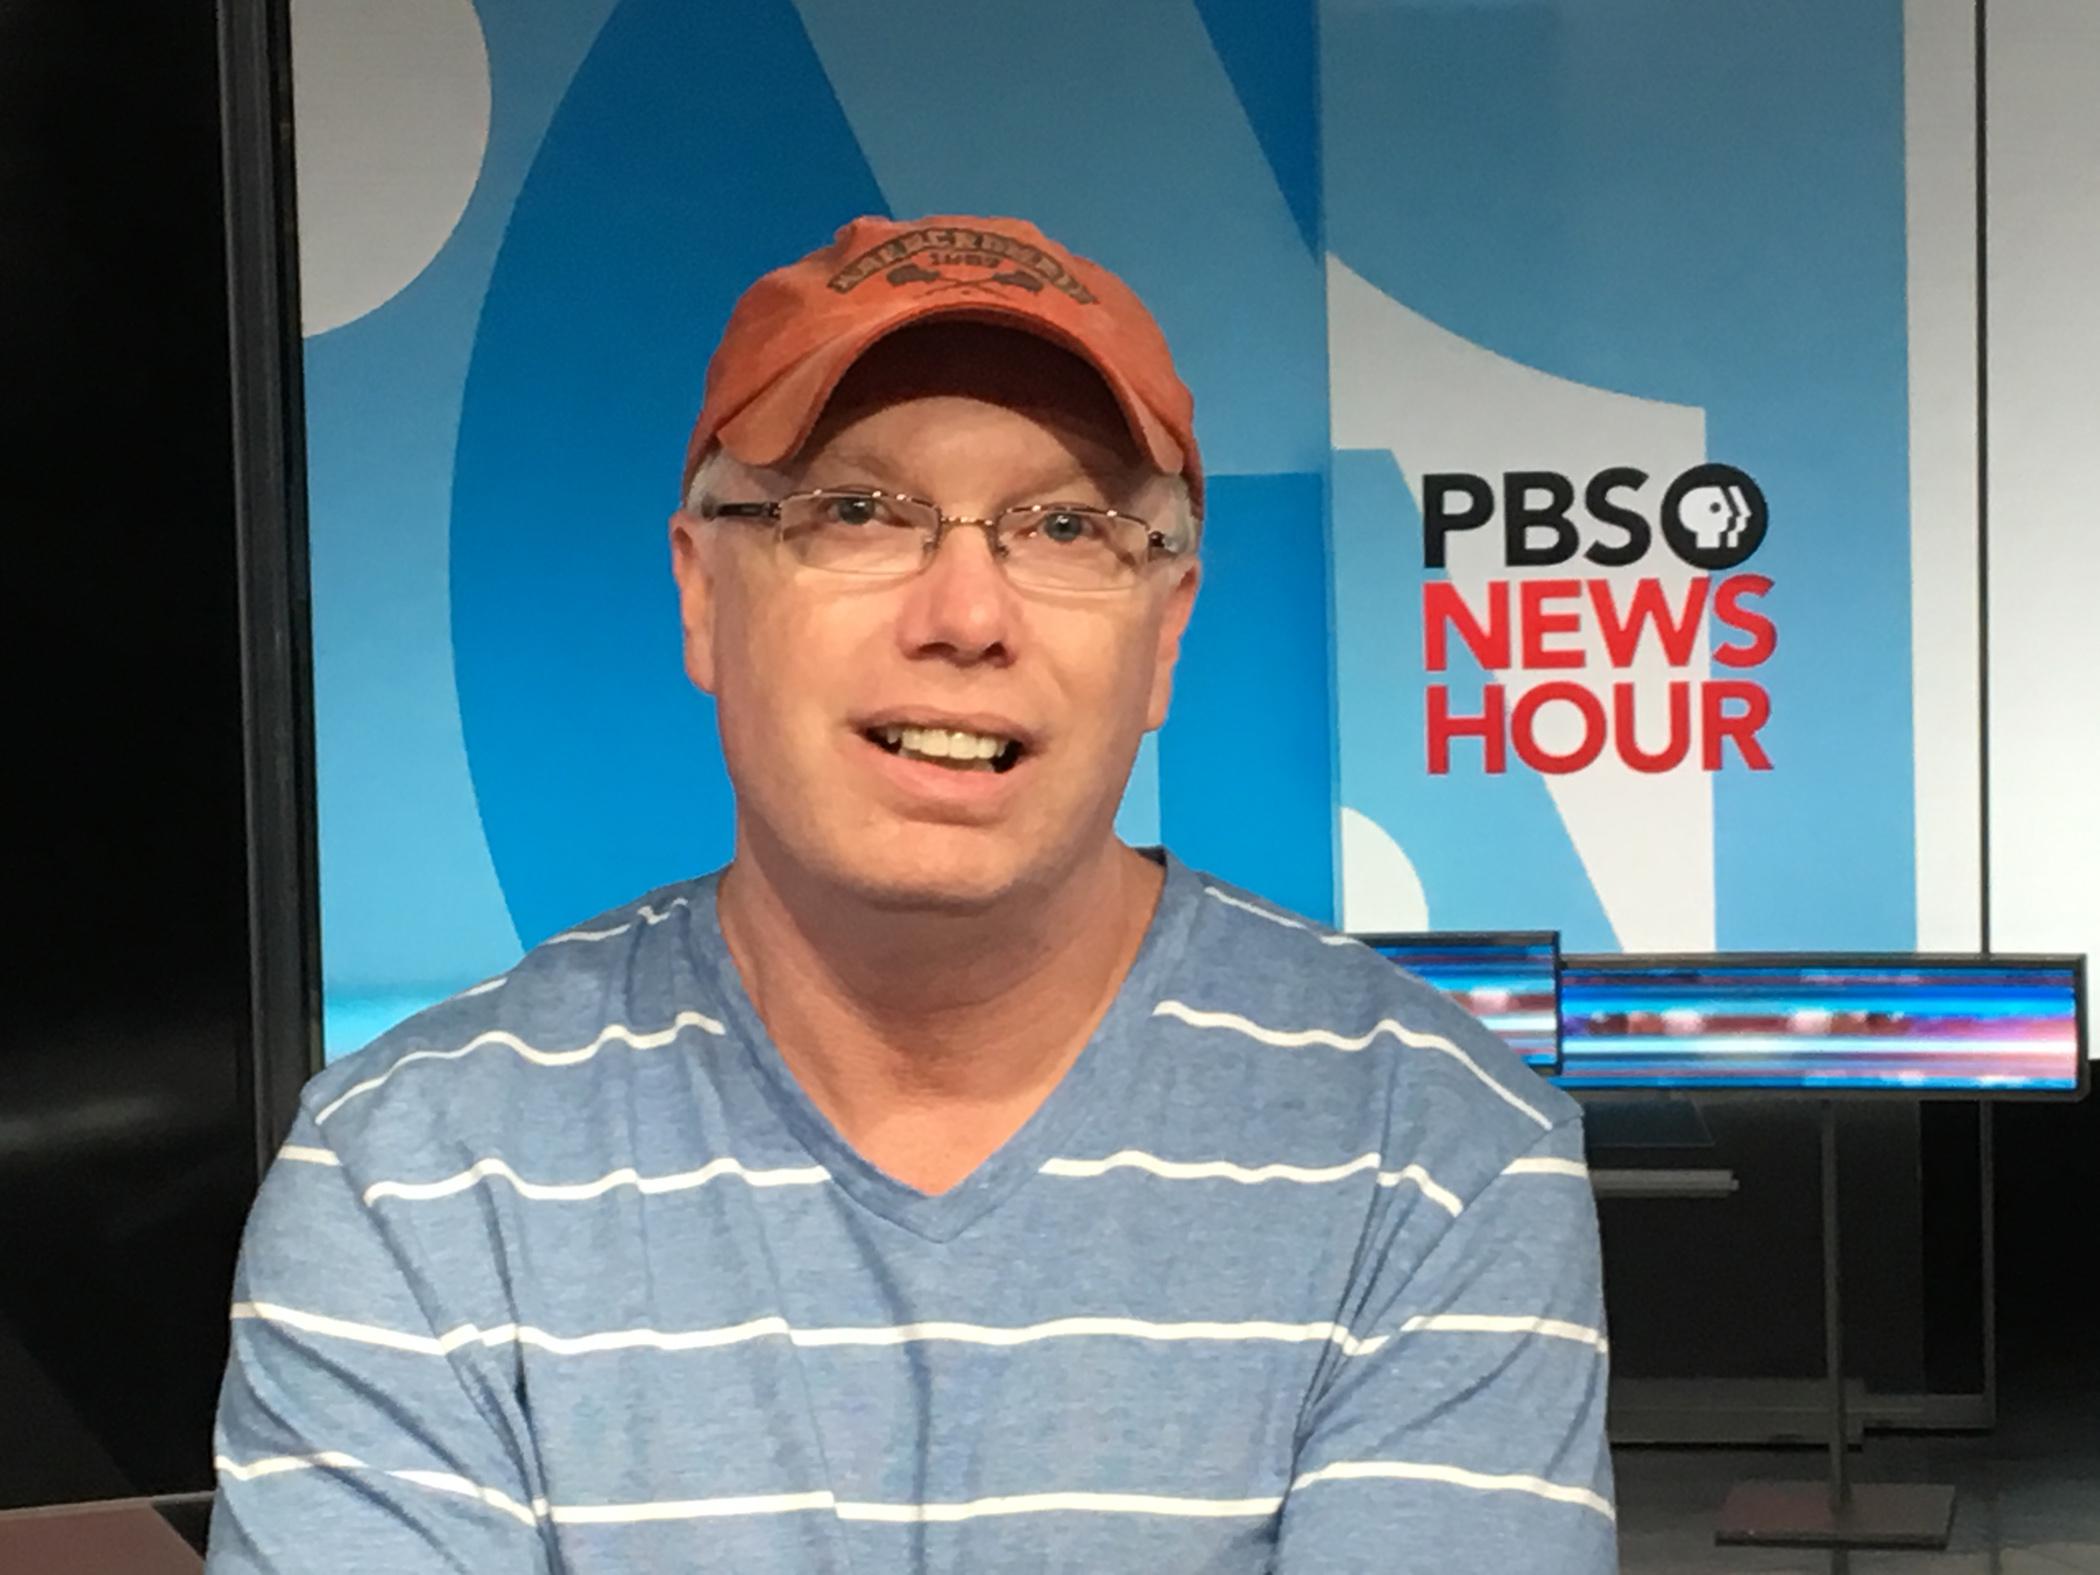 PBS NewsHour Audio Supervisor Tom Satterfield